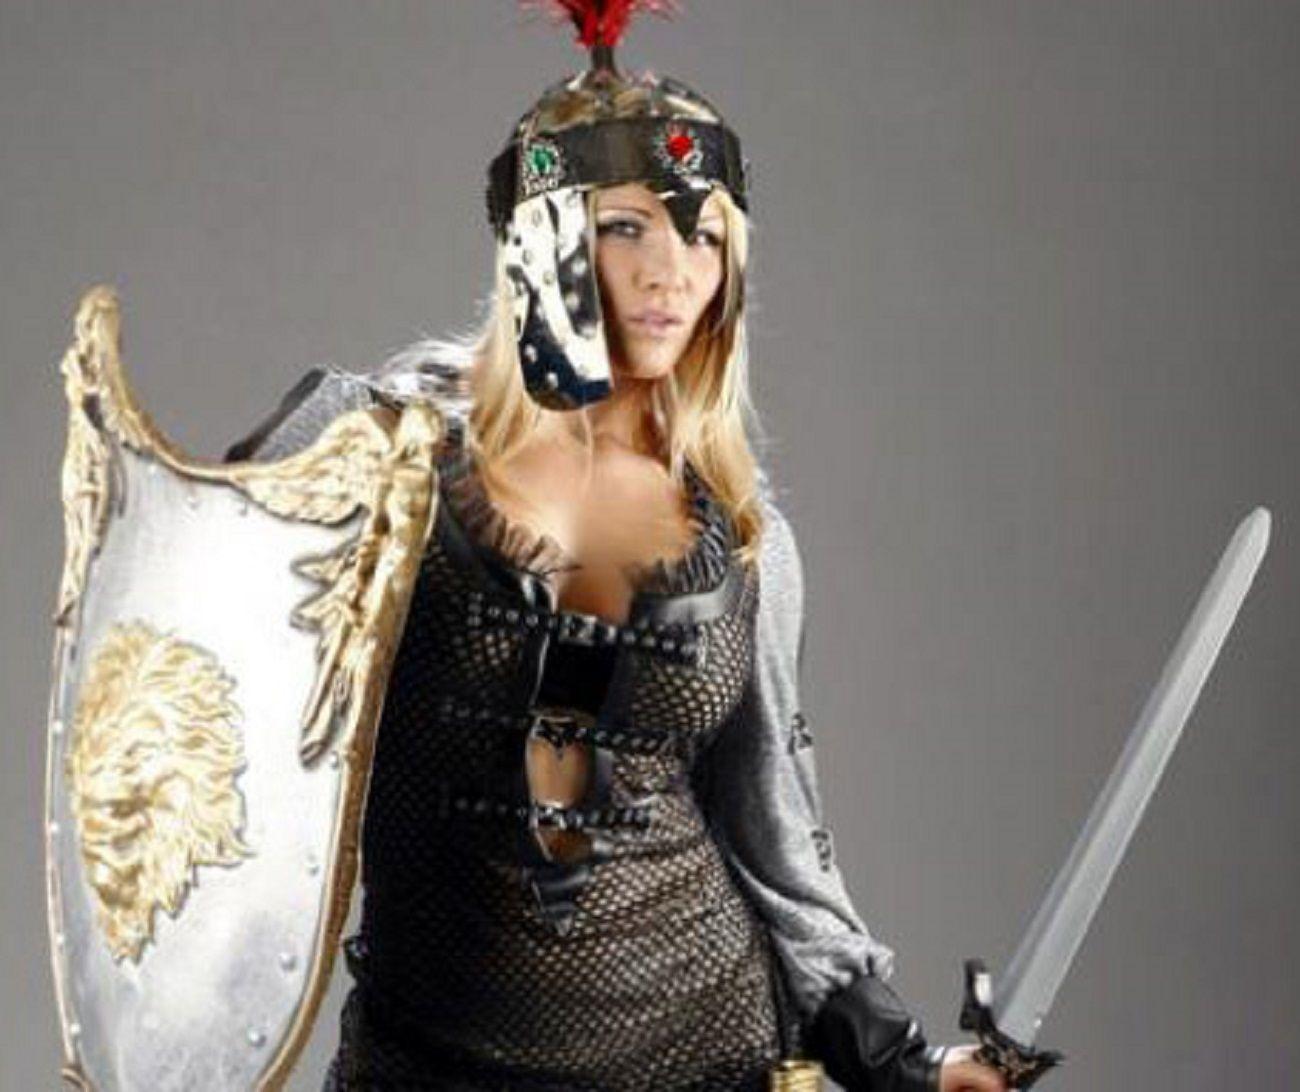 Vickie Guerrero Compilation 2012